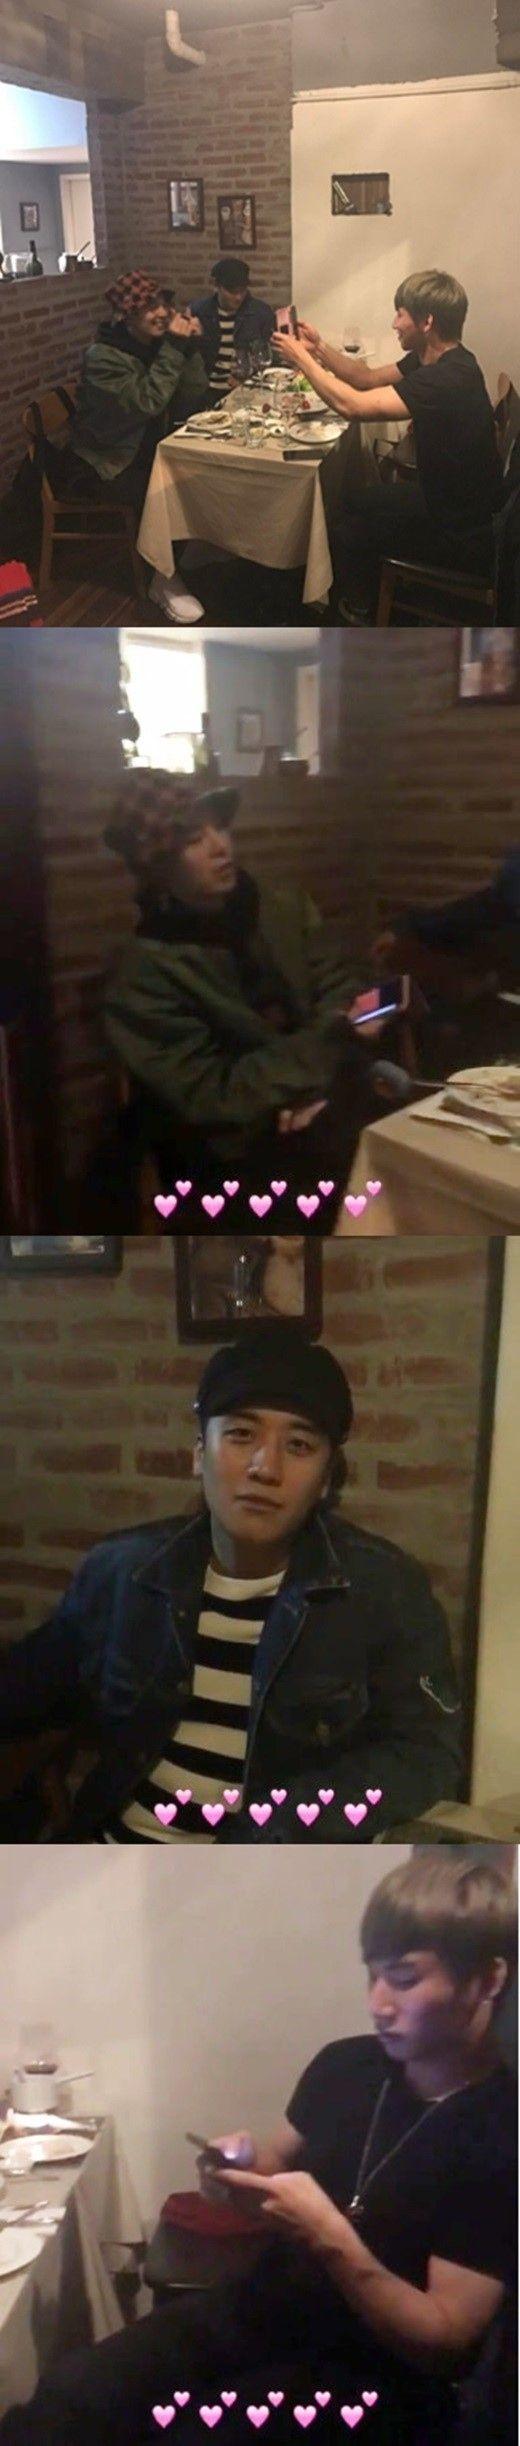 【BIGBANG NEWS】BIGBANG、メンバーたちが集合!軍入隊中のT.O.Pを除く4人の食事会を公開